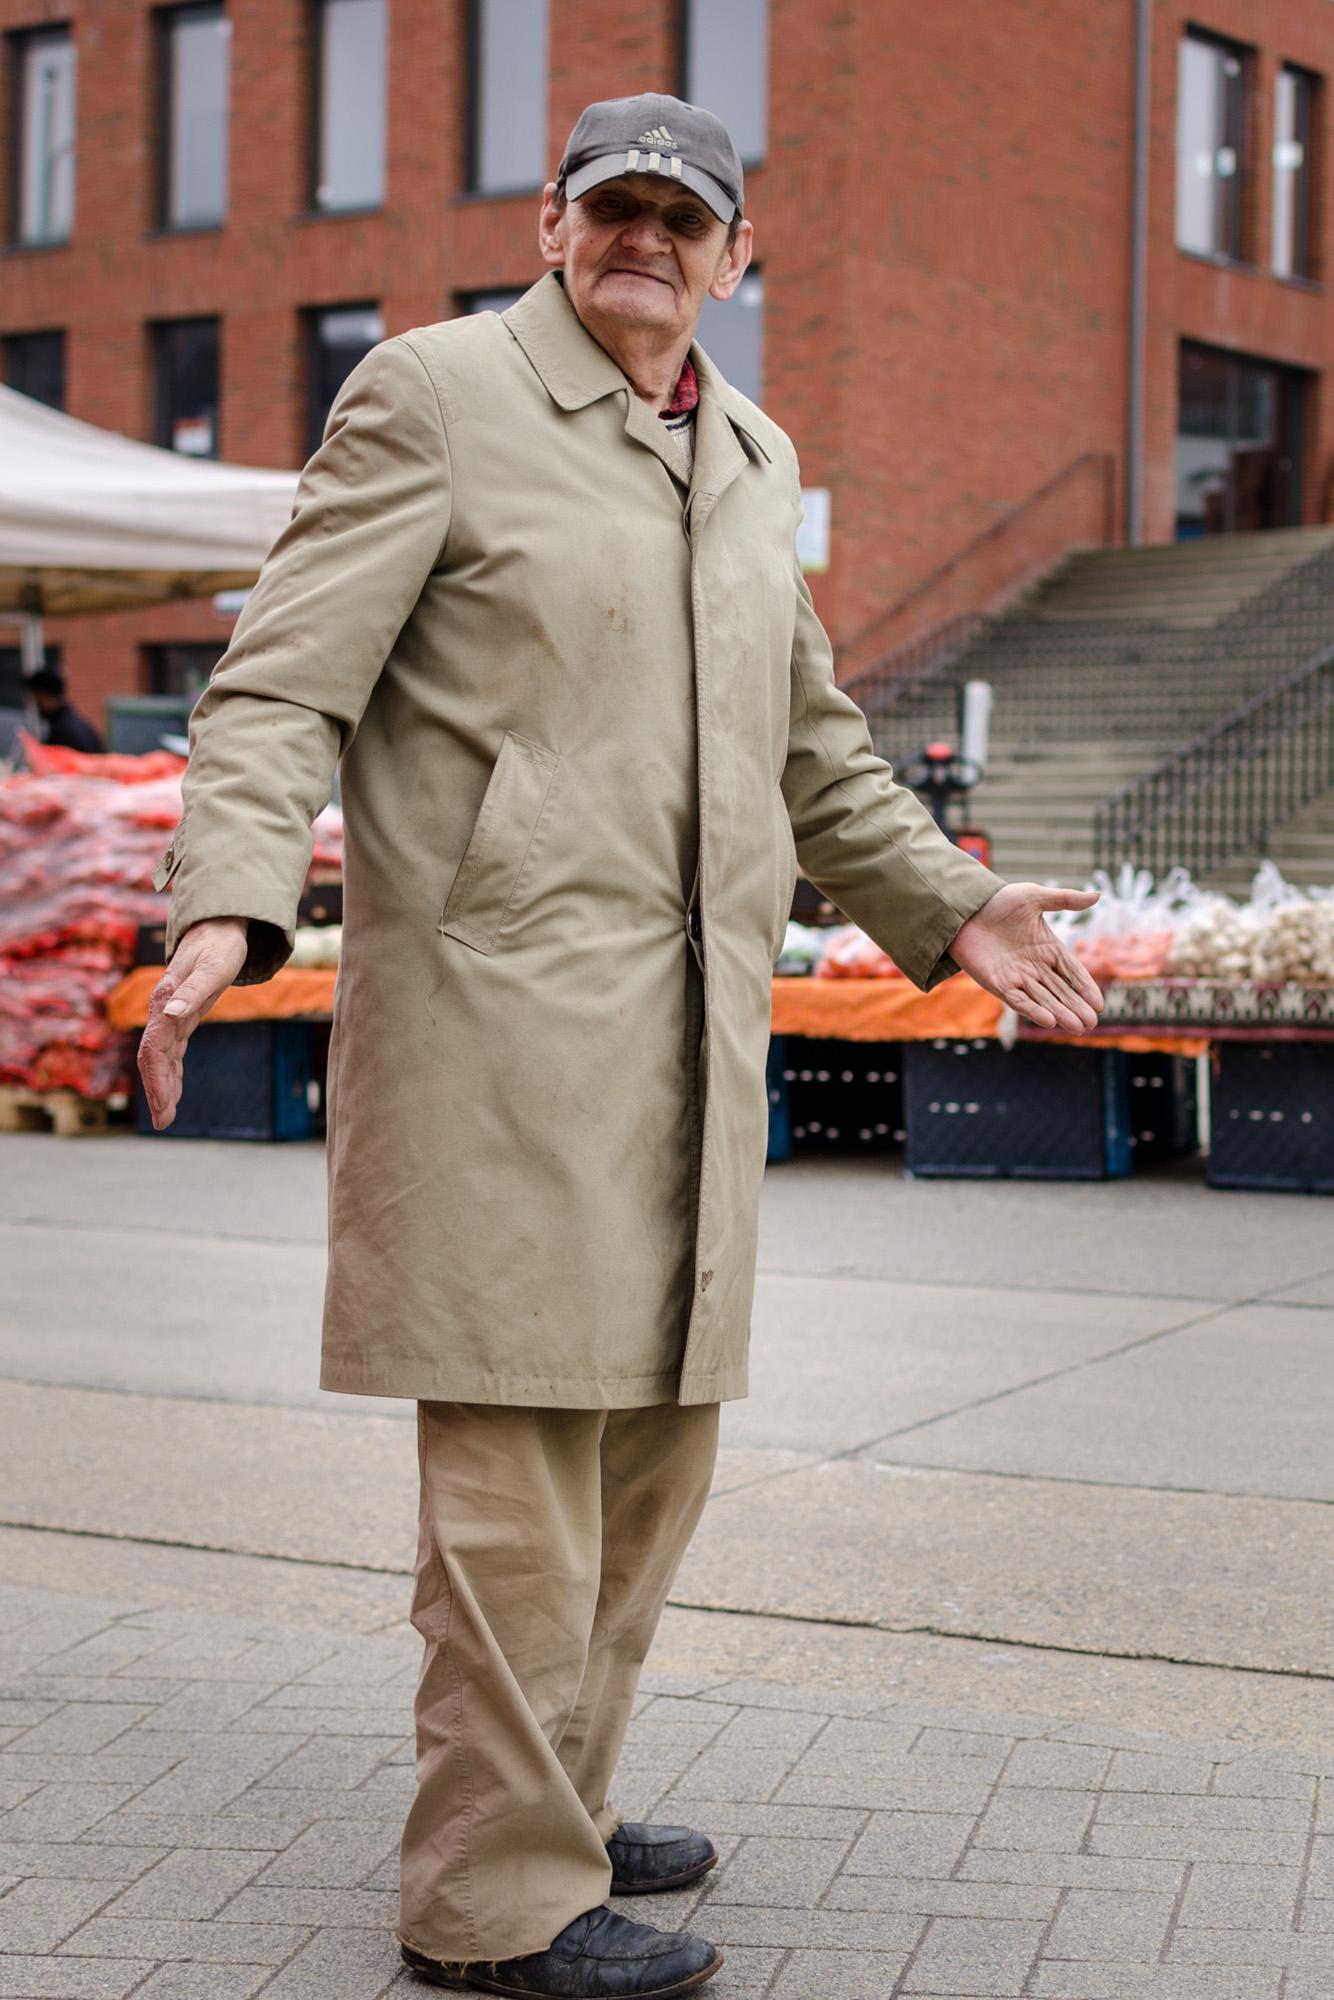 Man in stofjas 3 - straatfotografie :: foto-rv